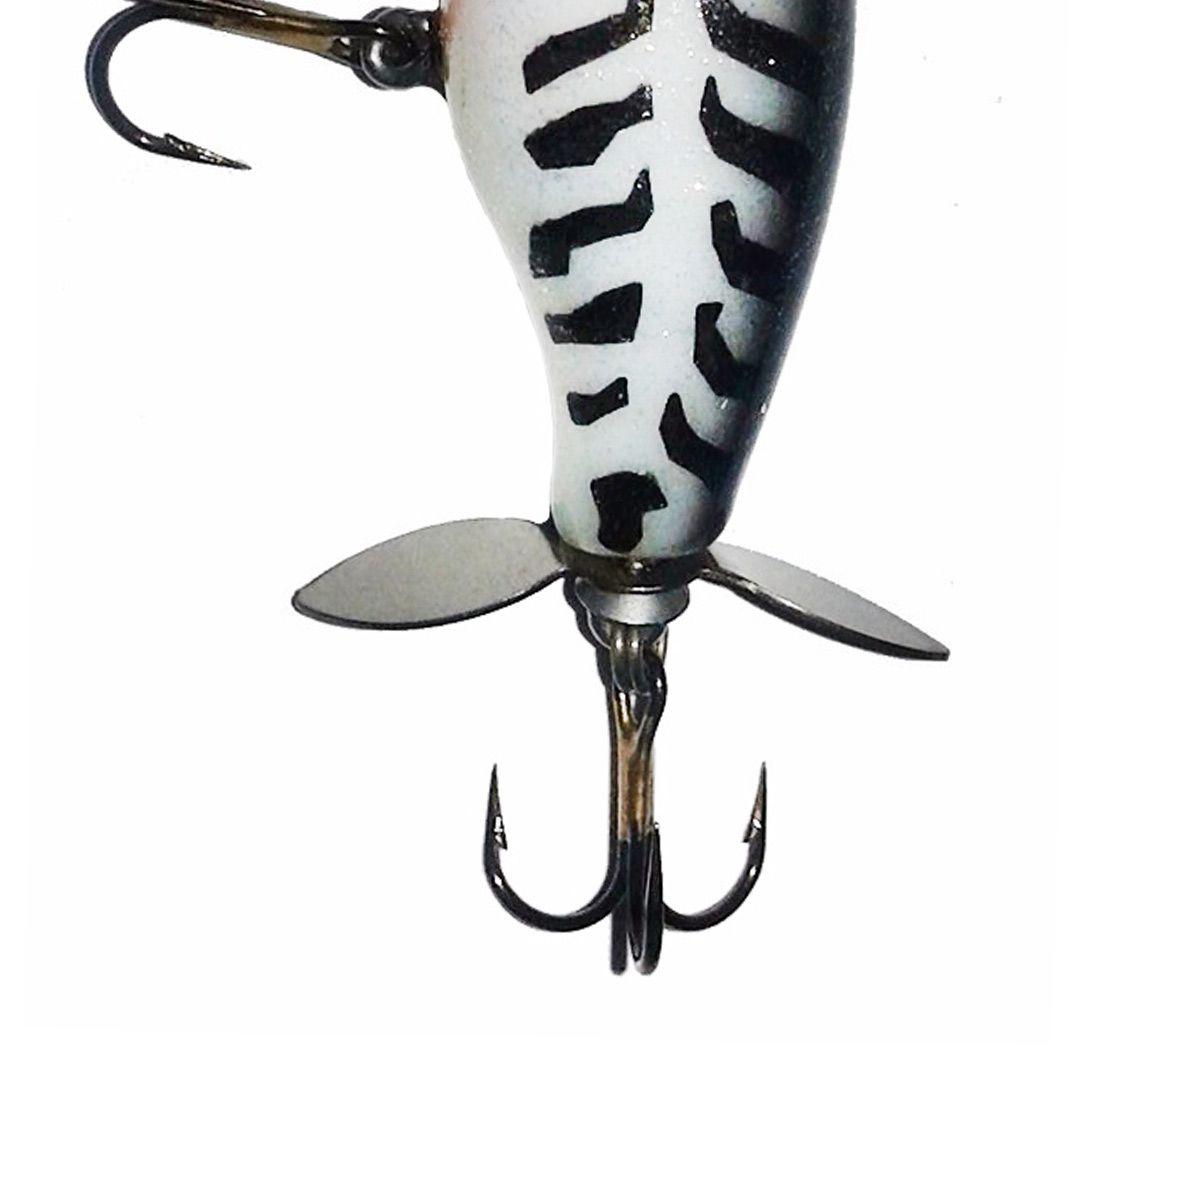 Isca Artificial Deconto Tilápia Turbo (Tibele) 4cm 5g